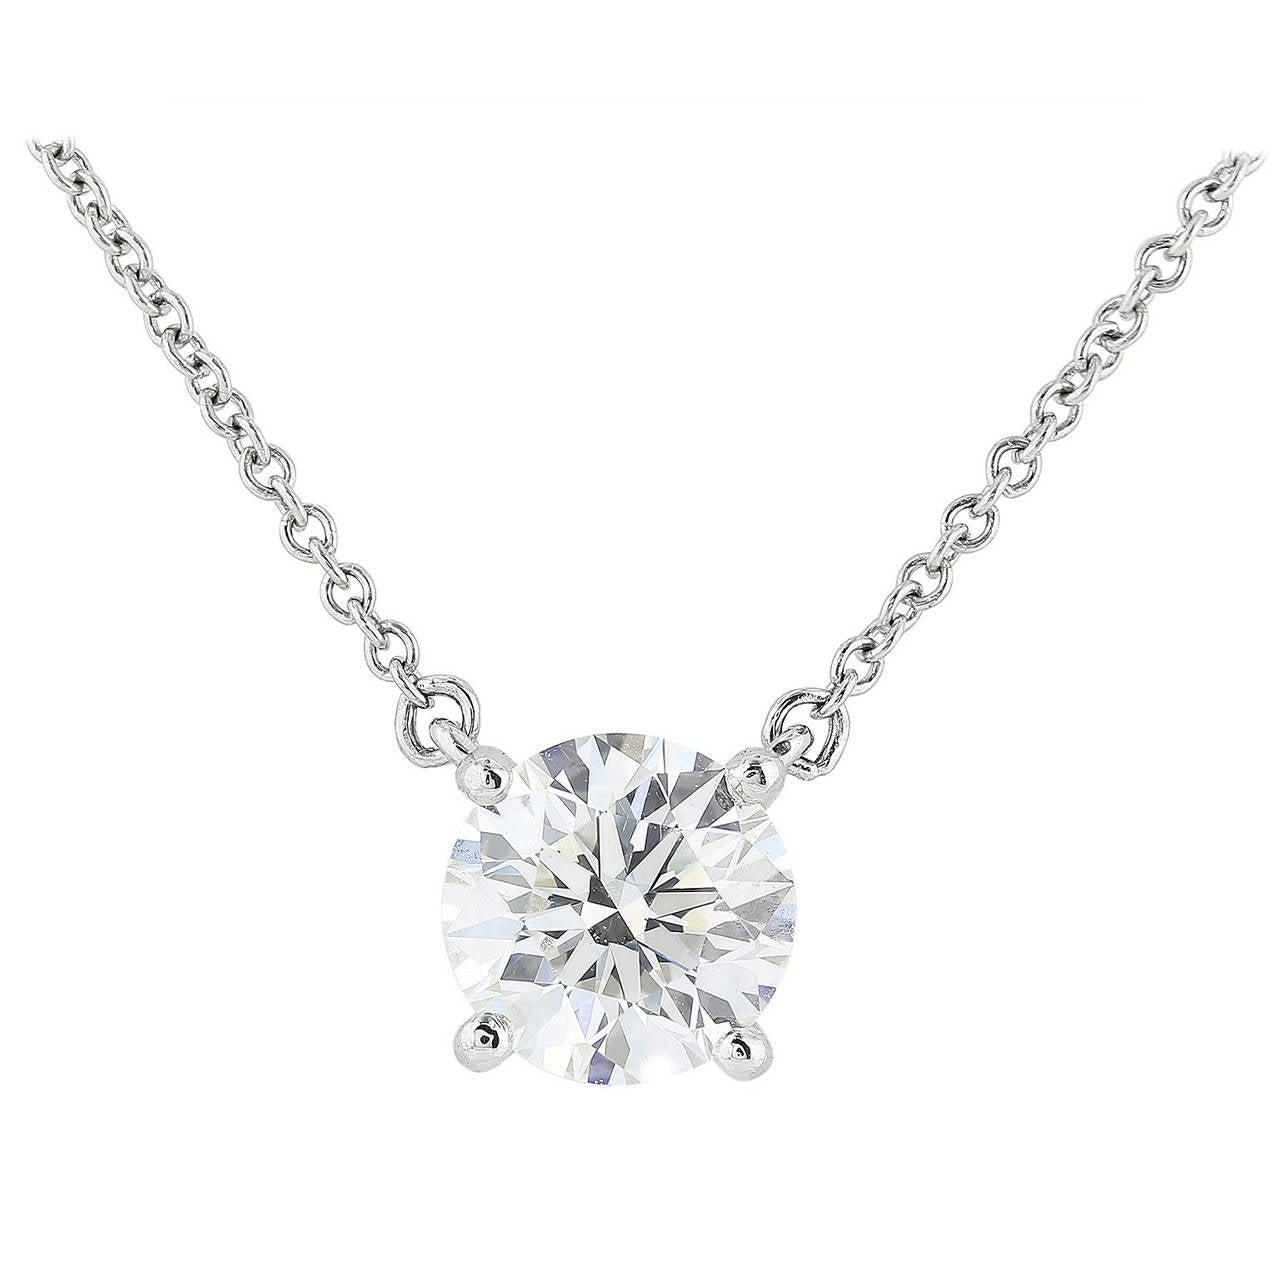 Tiffany And Co 1 23 Carat Diamond Platinum Pendant At 1stdibs